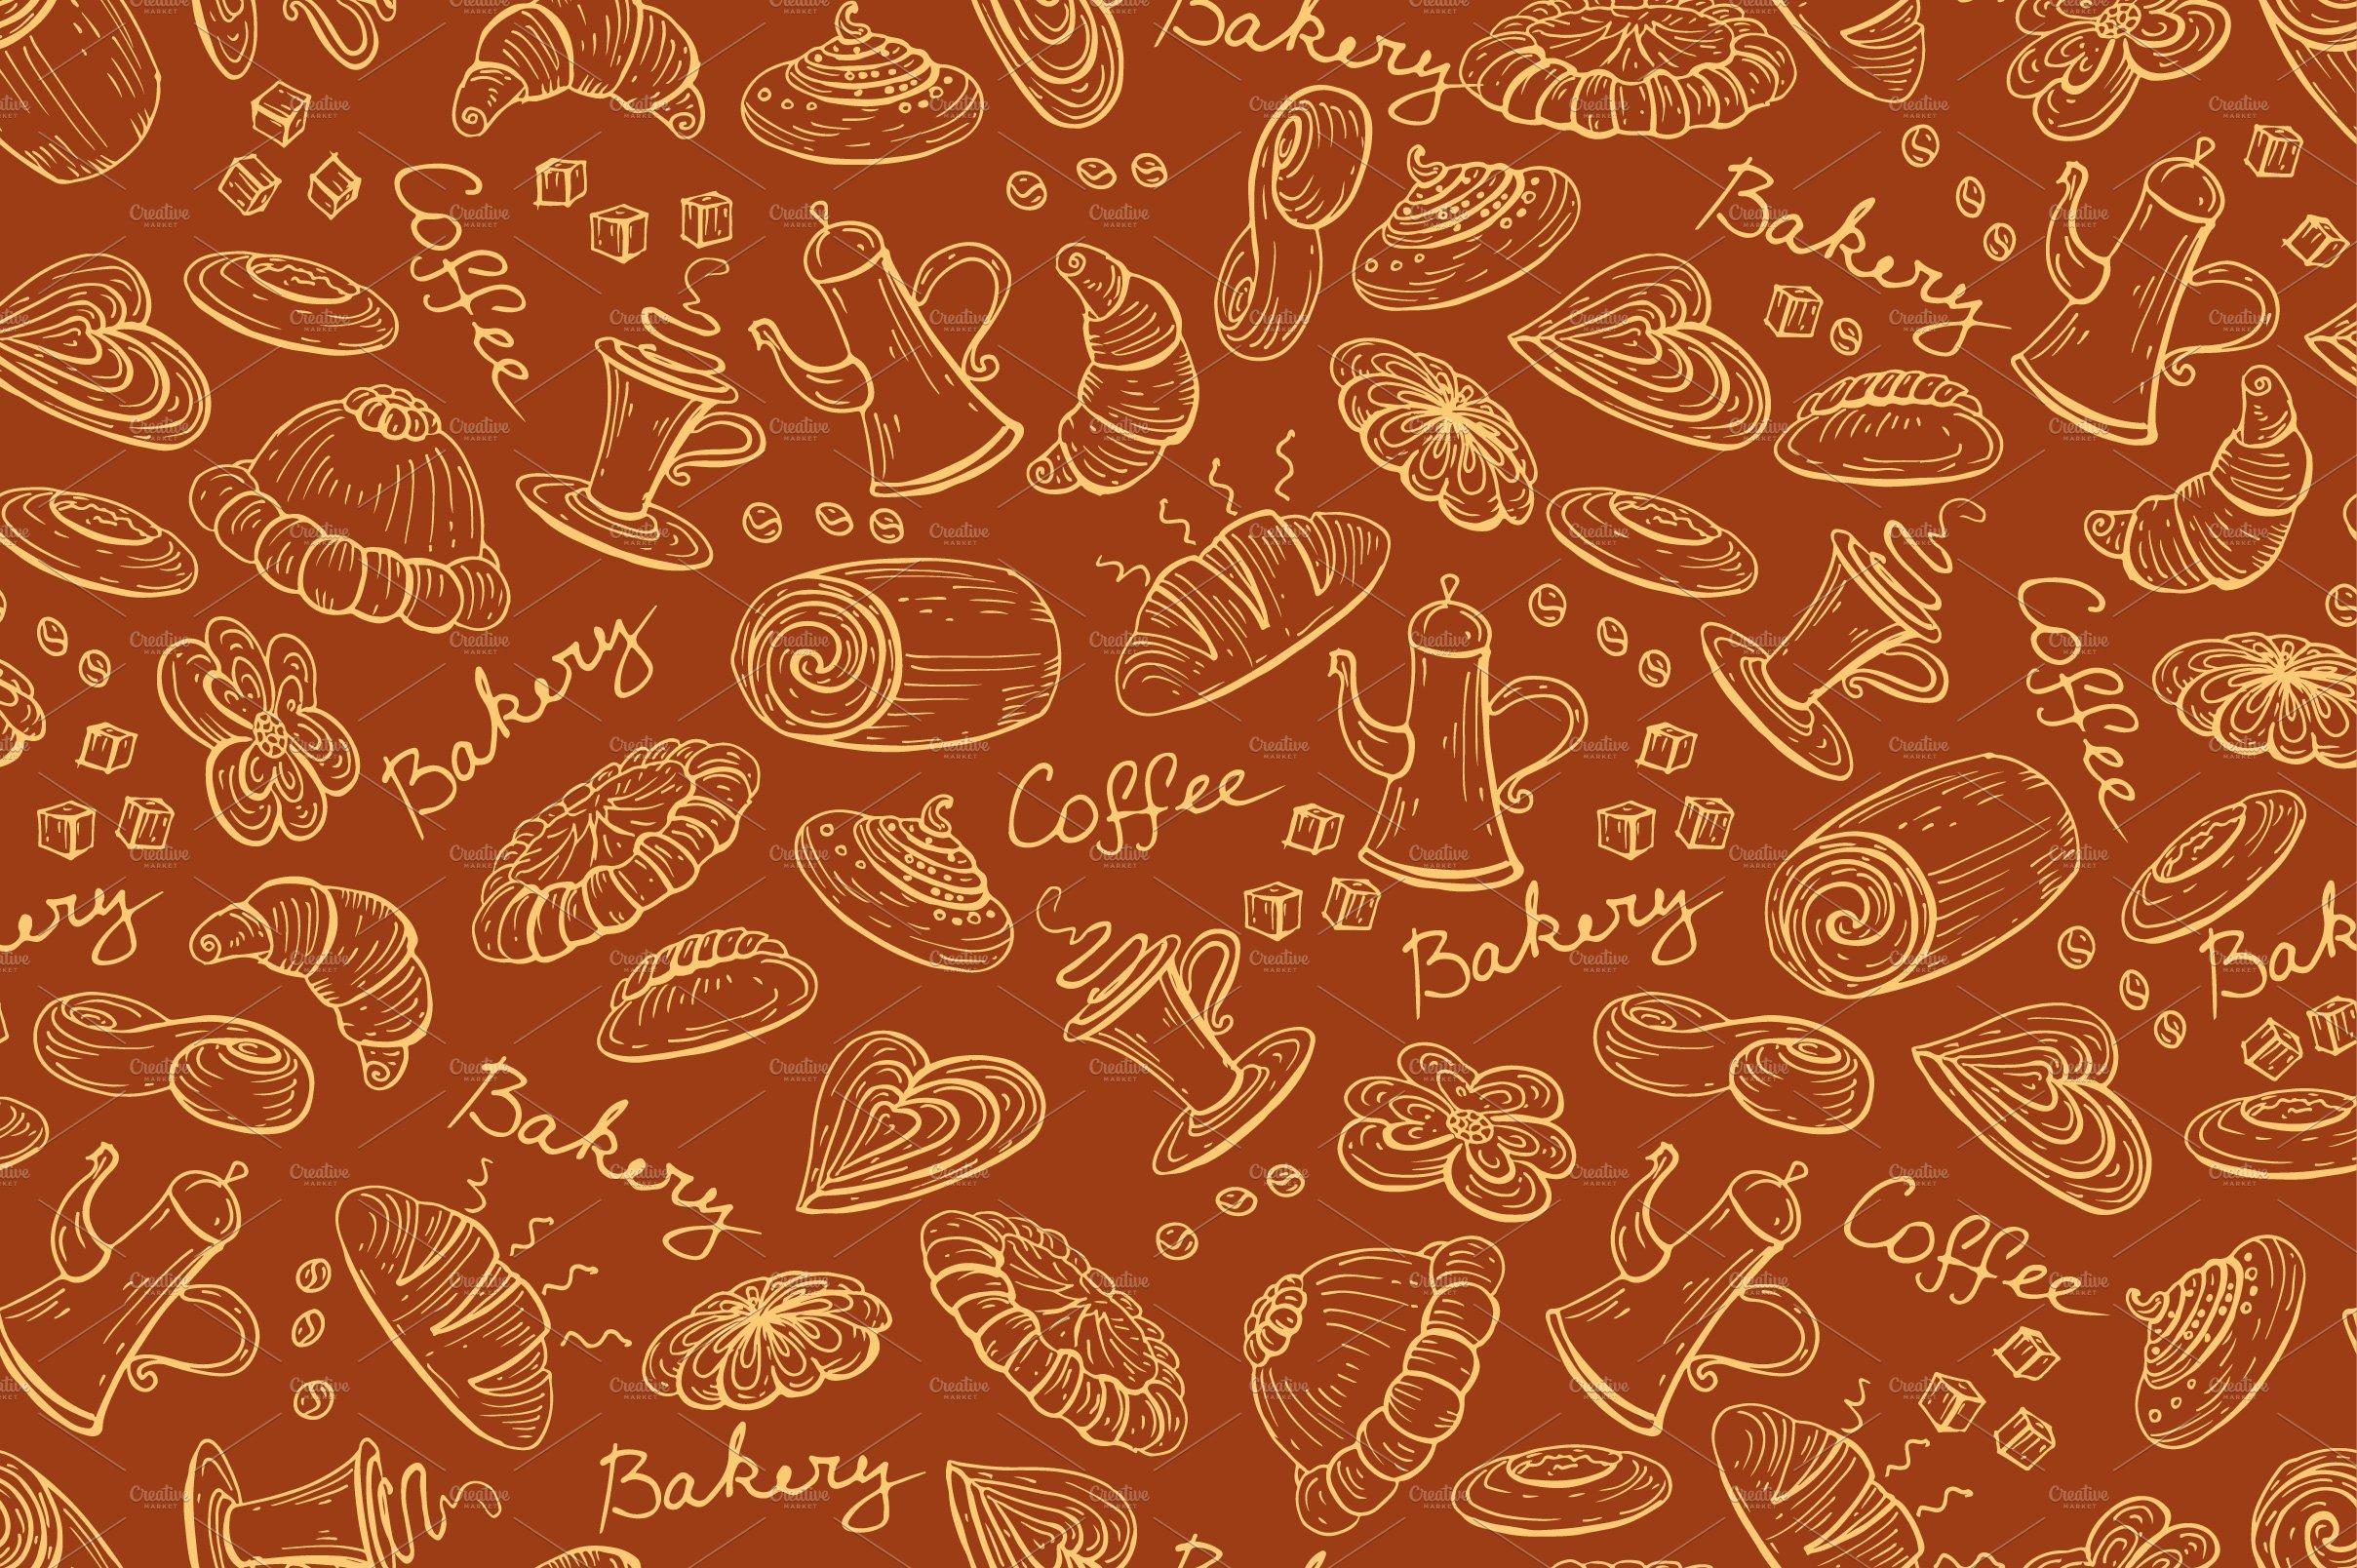 Joomla Food Templates Free Download